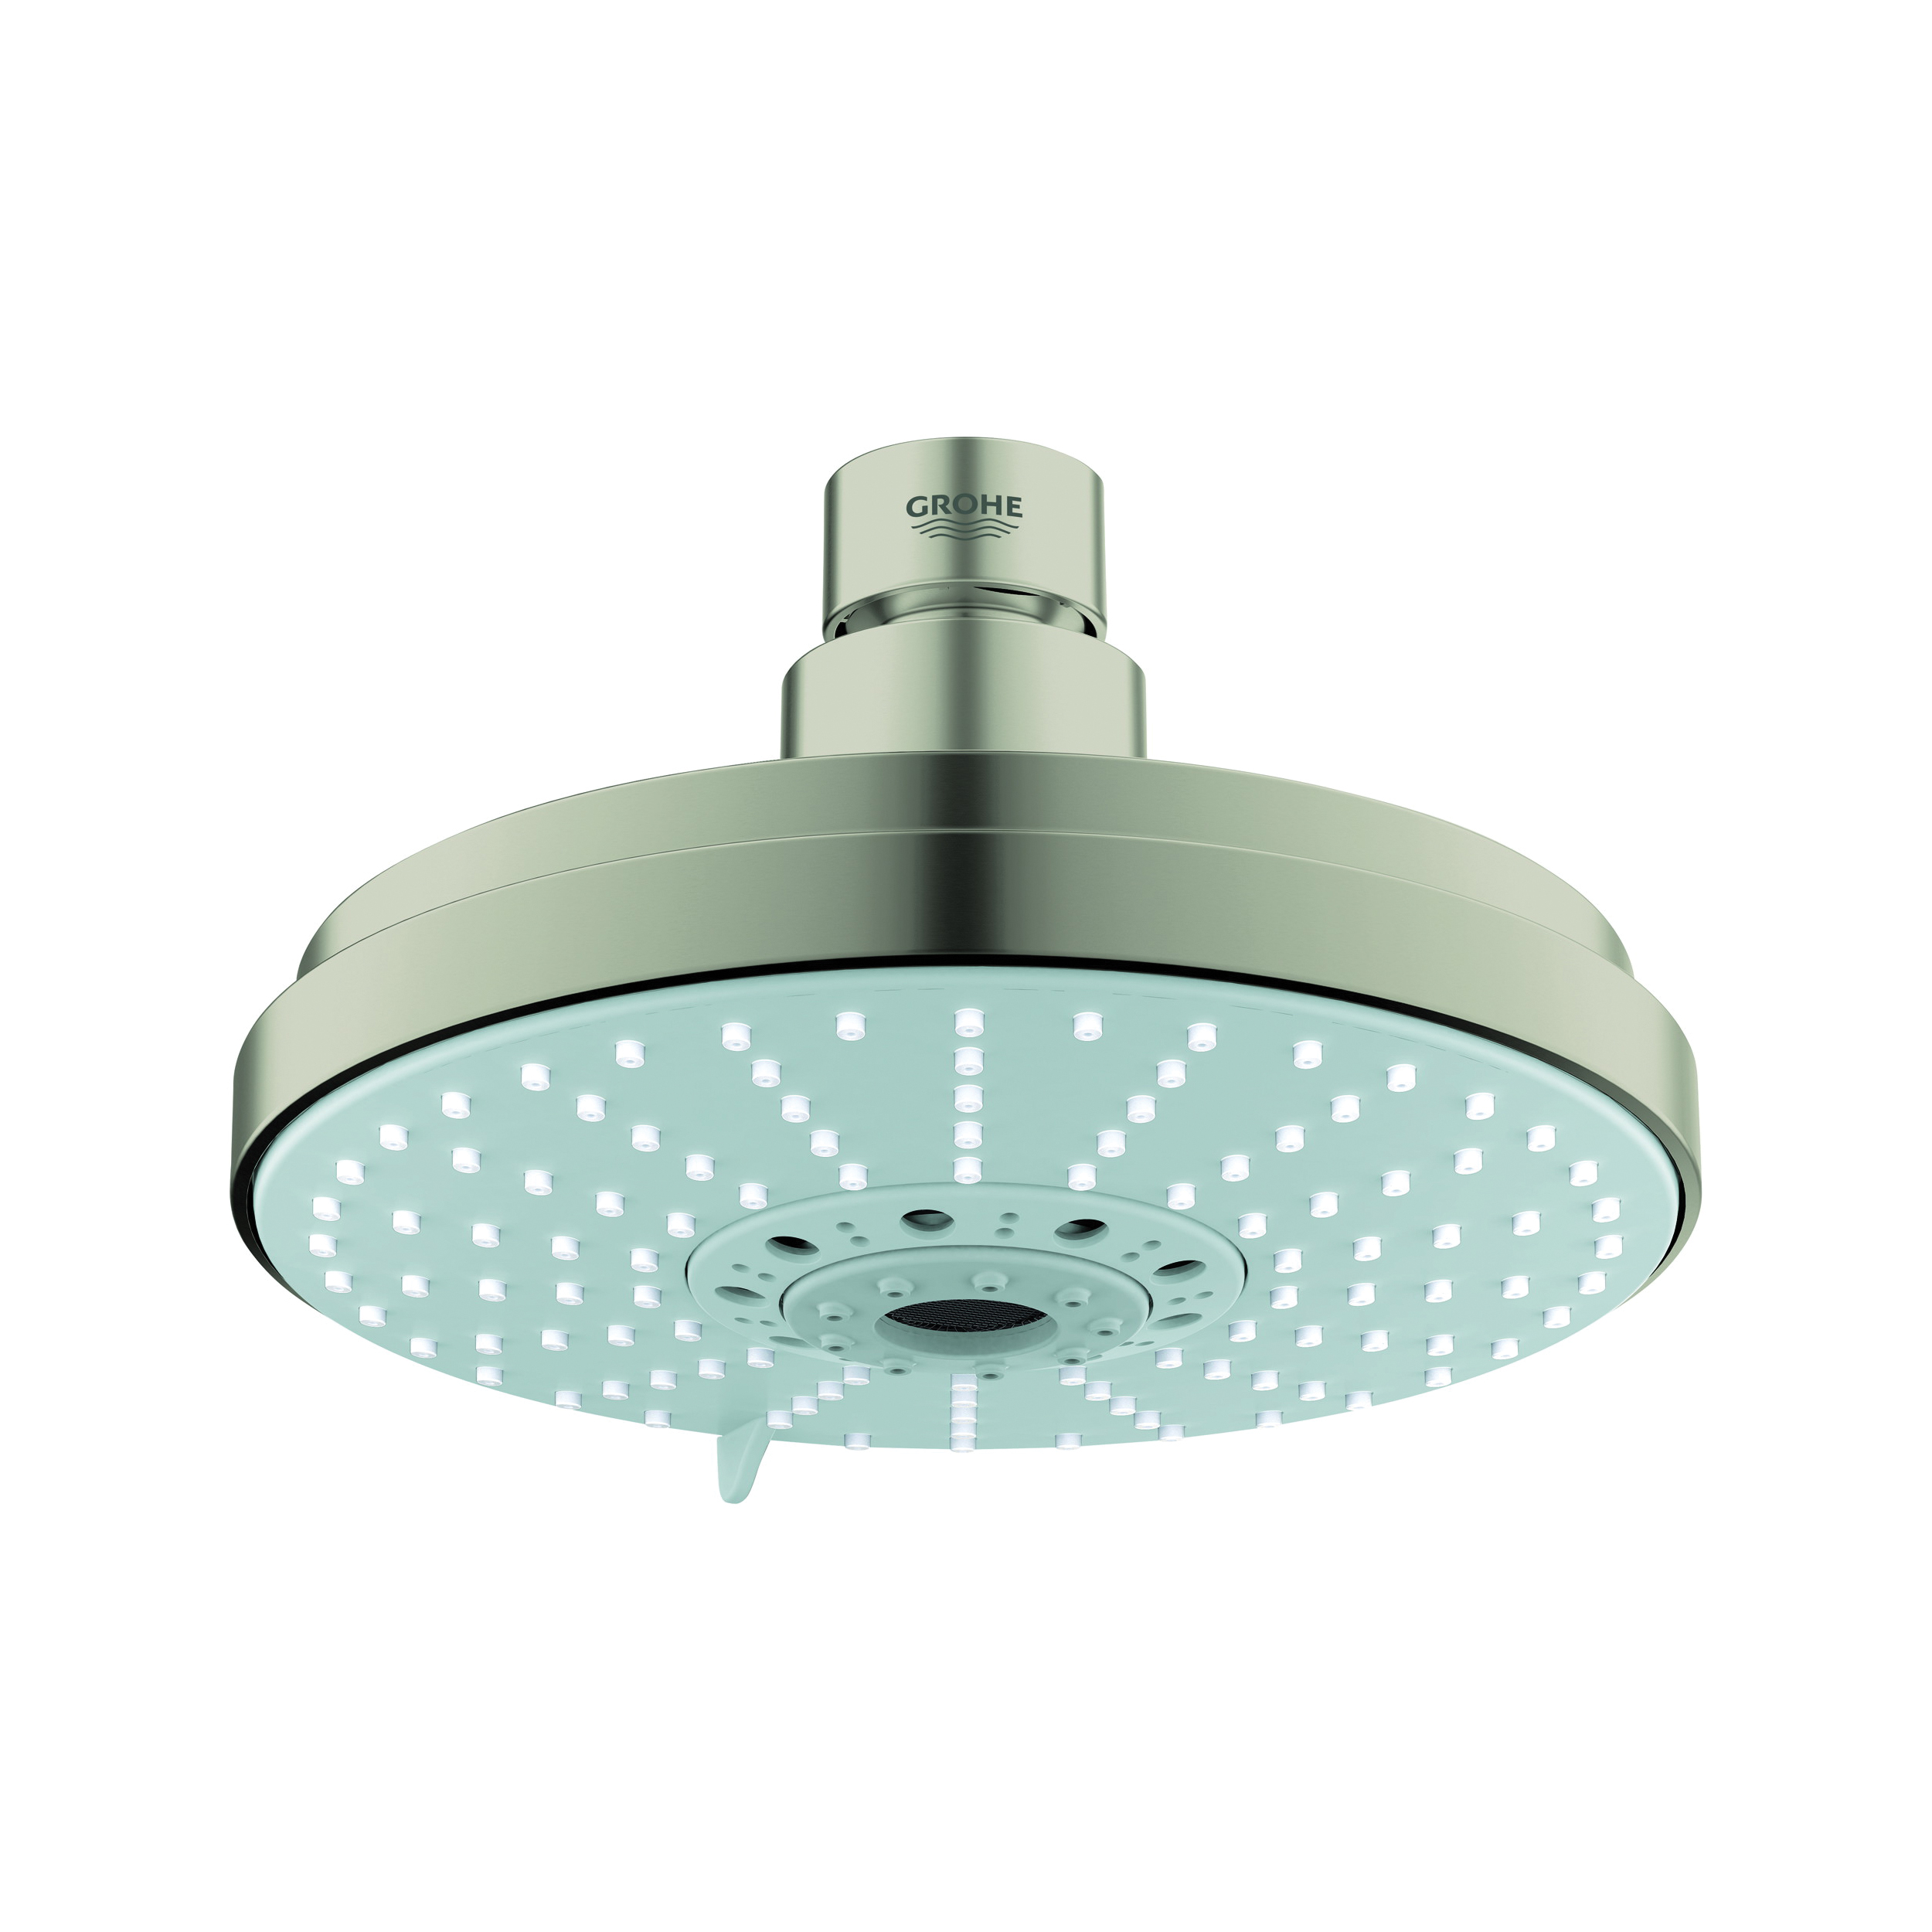 GROHE 27135EN0 Rainshower® Cosmopolitan 160 Shower Head, 2.5 gpm, 4 Sprays, Ceiling Mount, 6-5/16 in Dia Head, Import